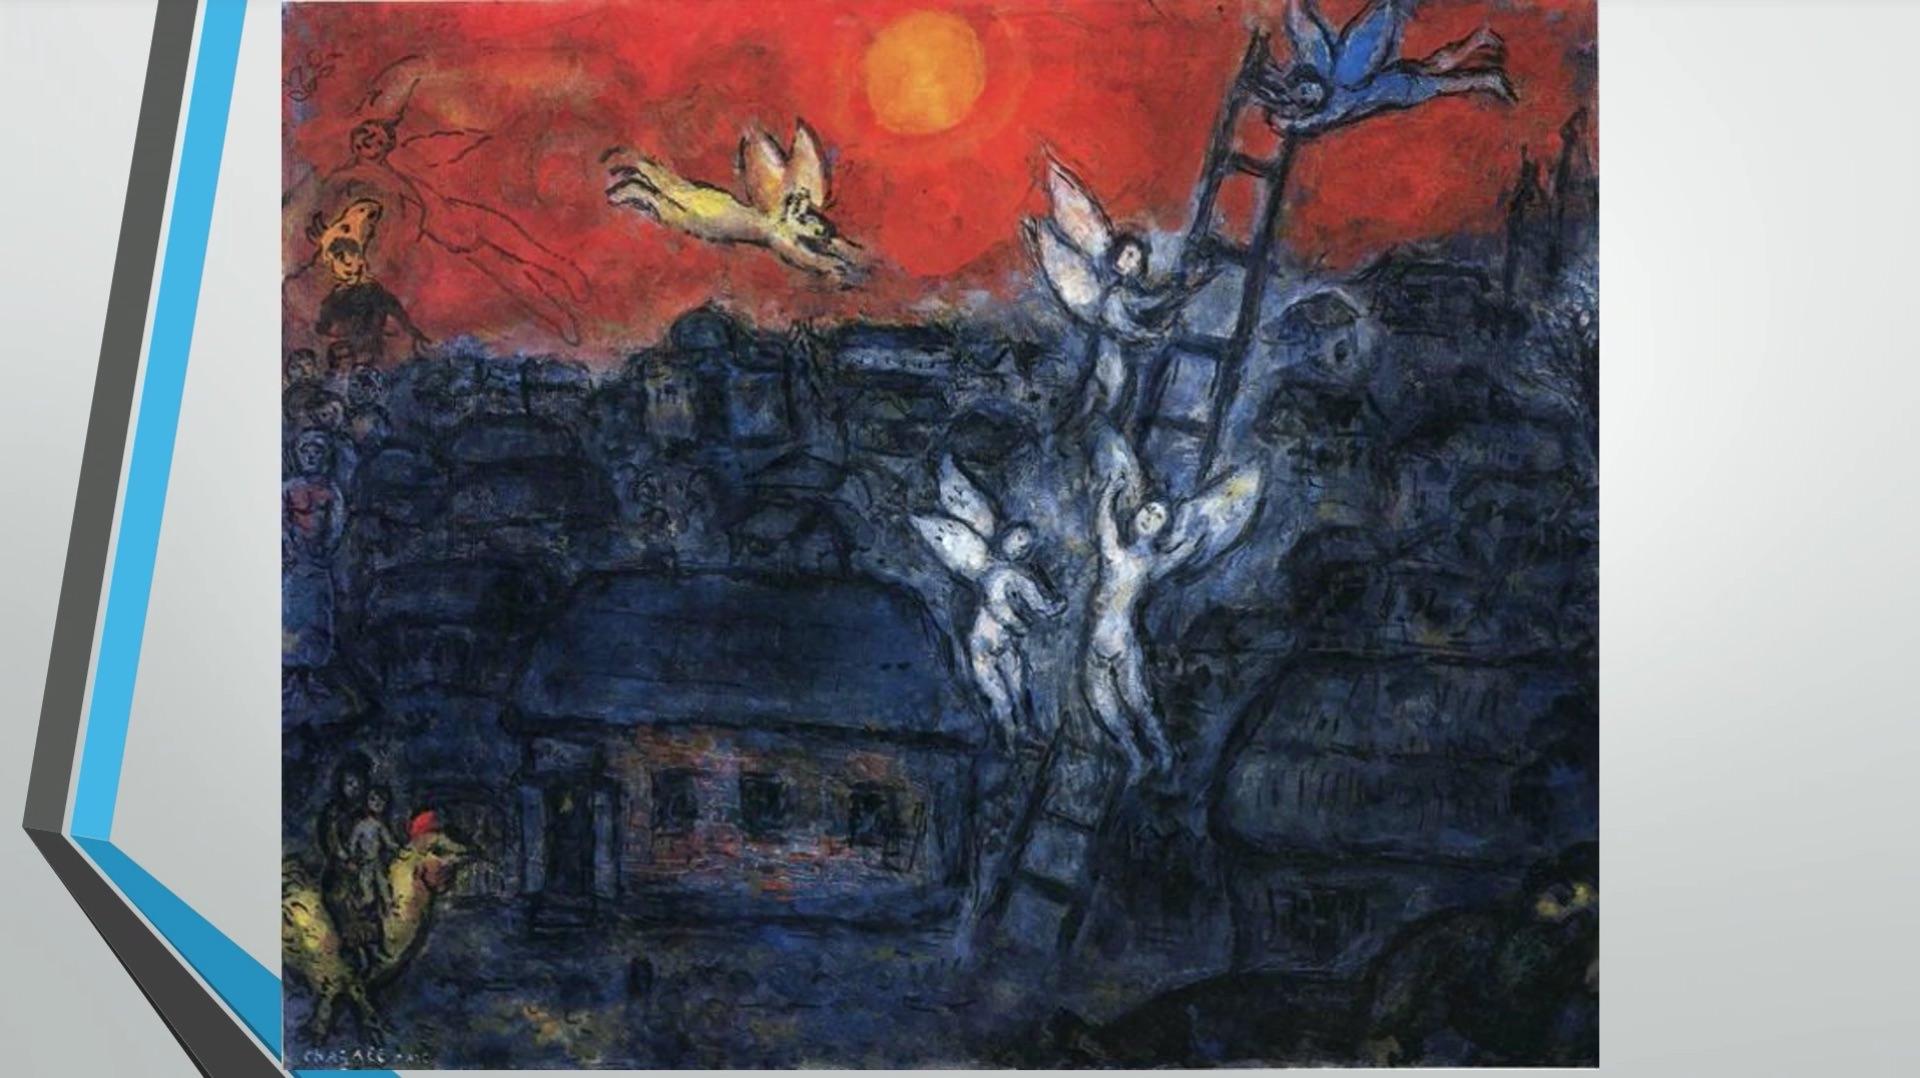 Biblical Series XIII: Jacob's Ladder Transcript | Jordan